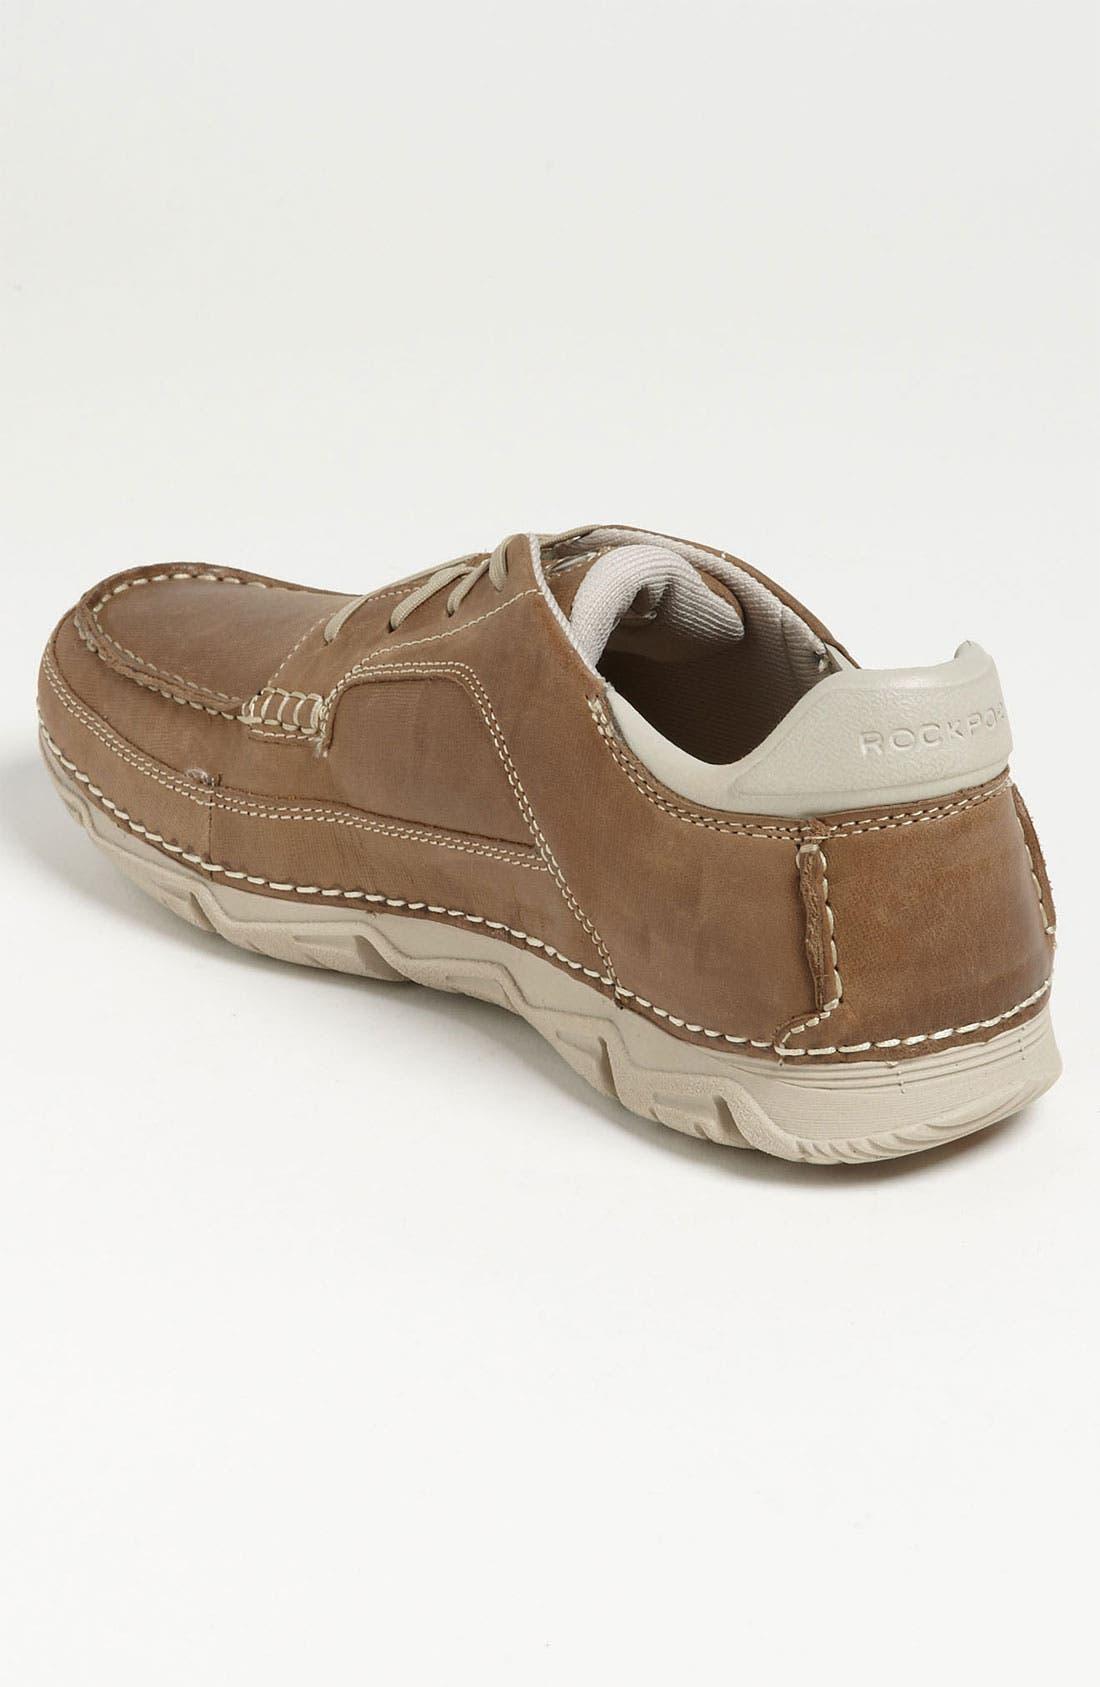 Alternate Image 2  - Rockport 'RocSports Lite' Sneaker